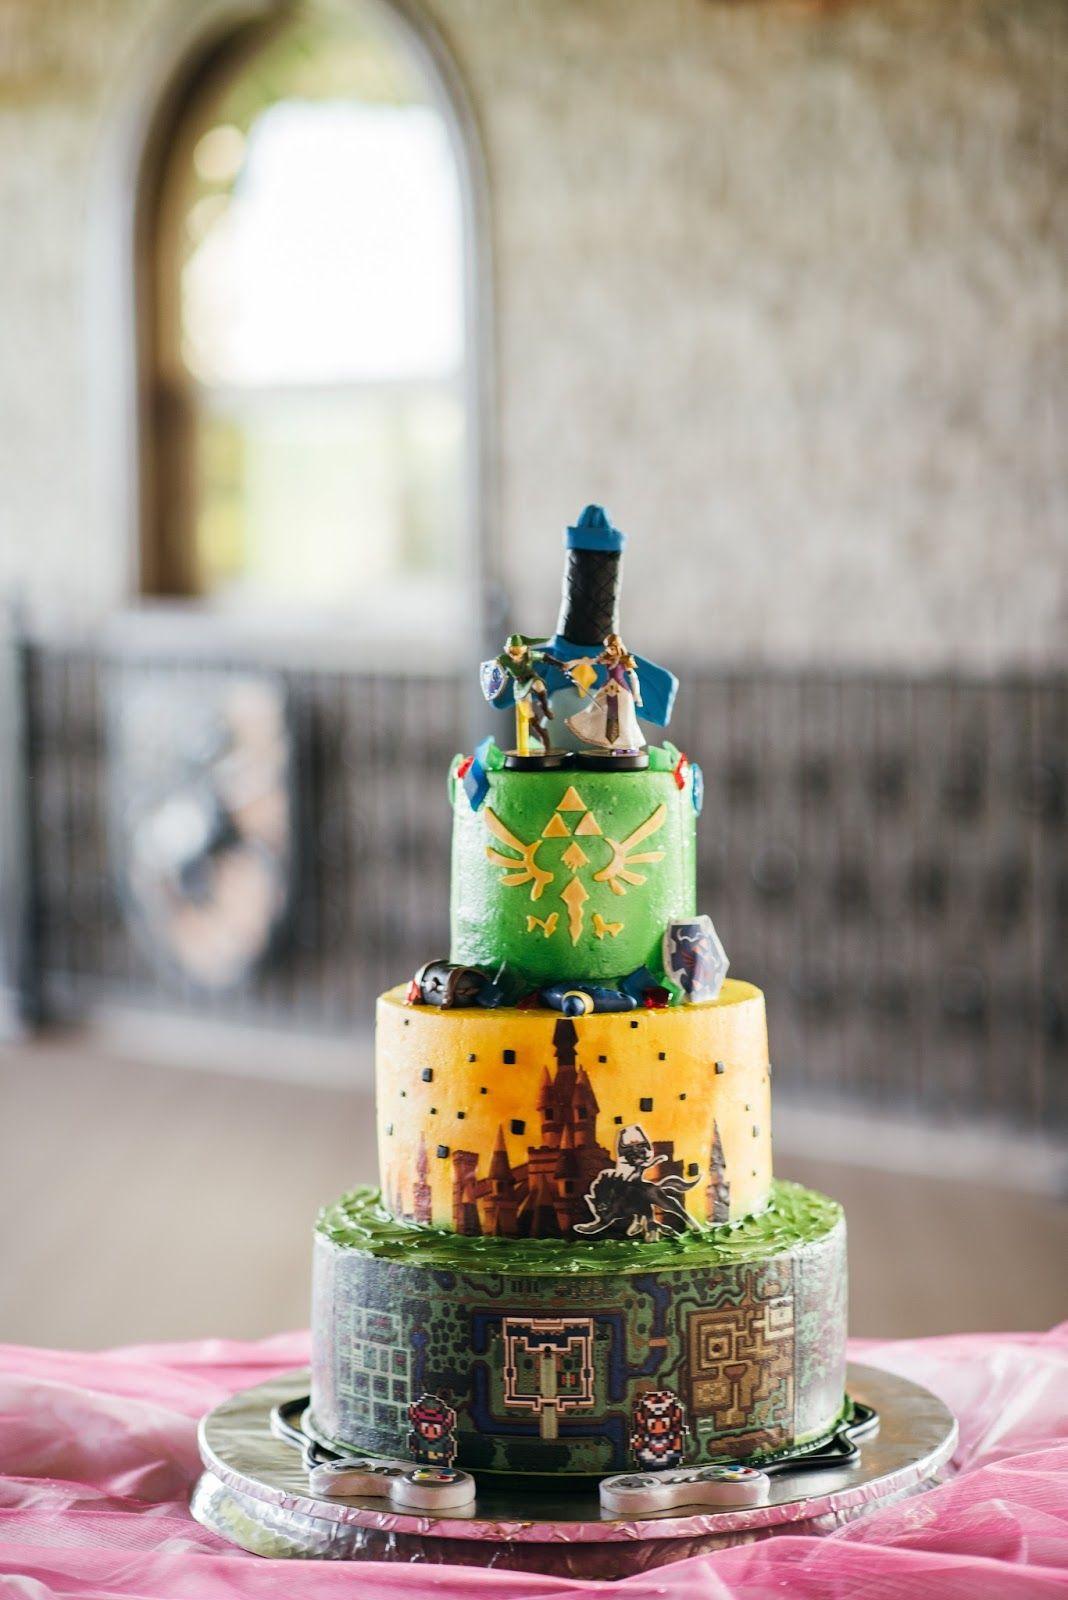 The Animated Anajo The Cake Legend Of Zelda Wedding Cake My